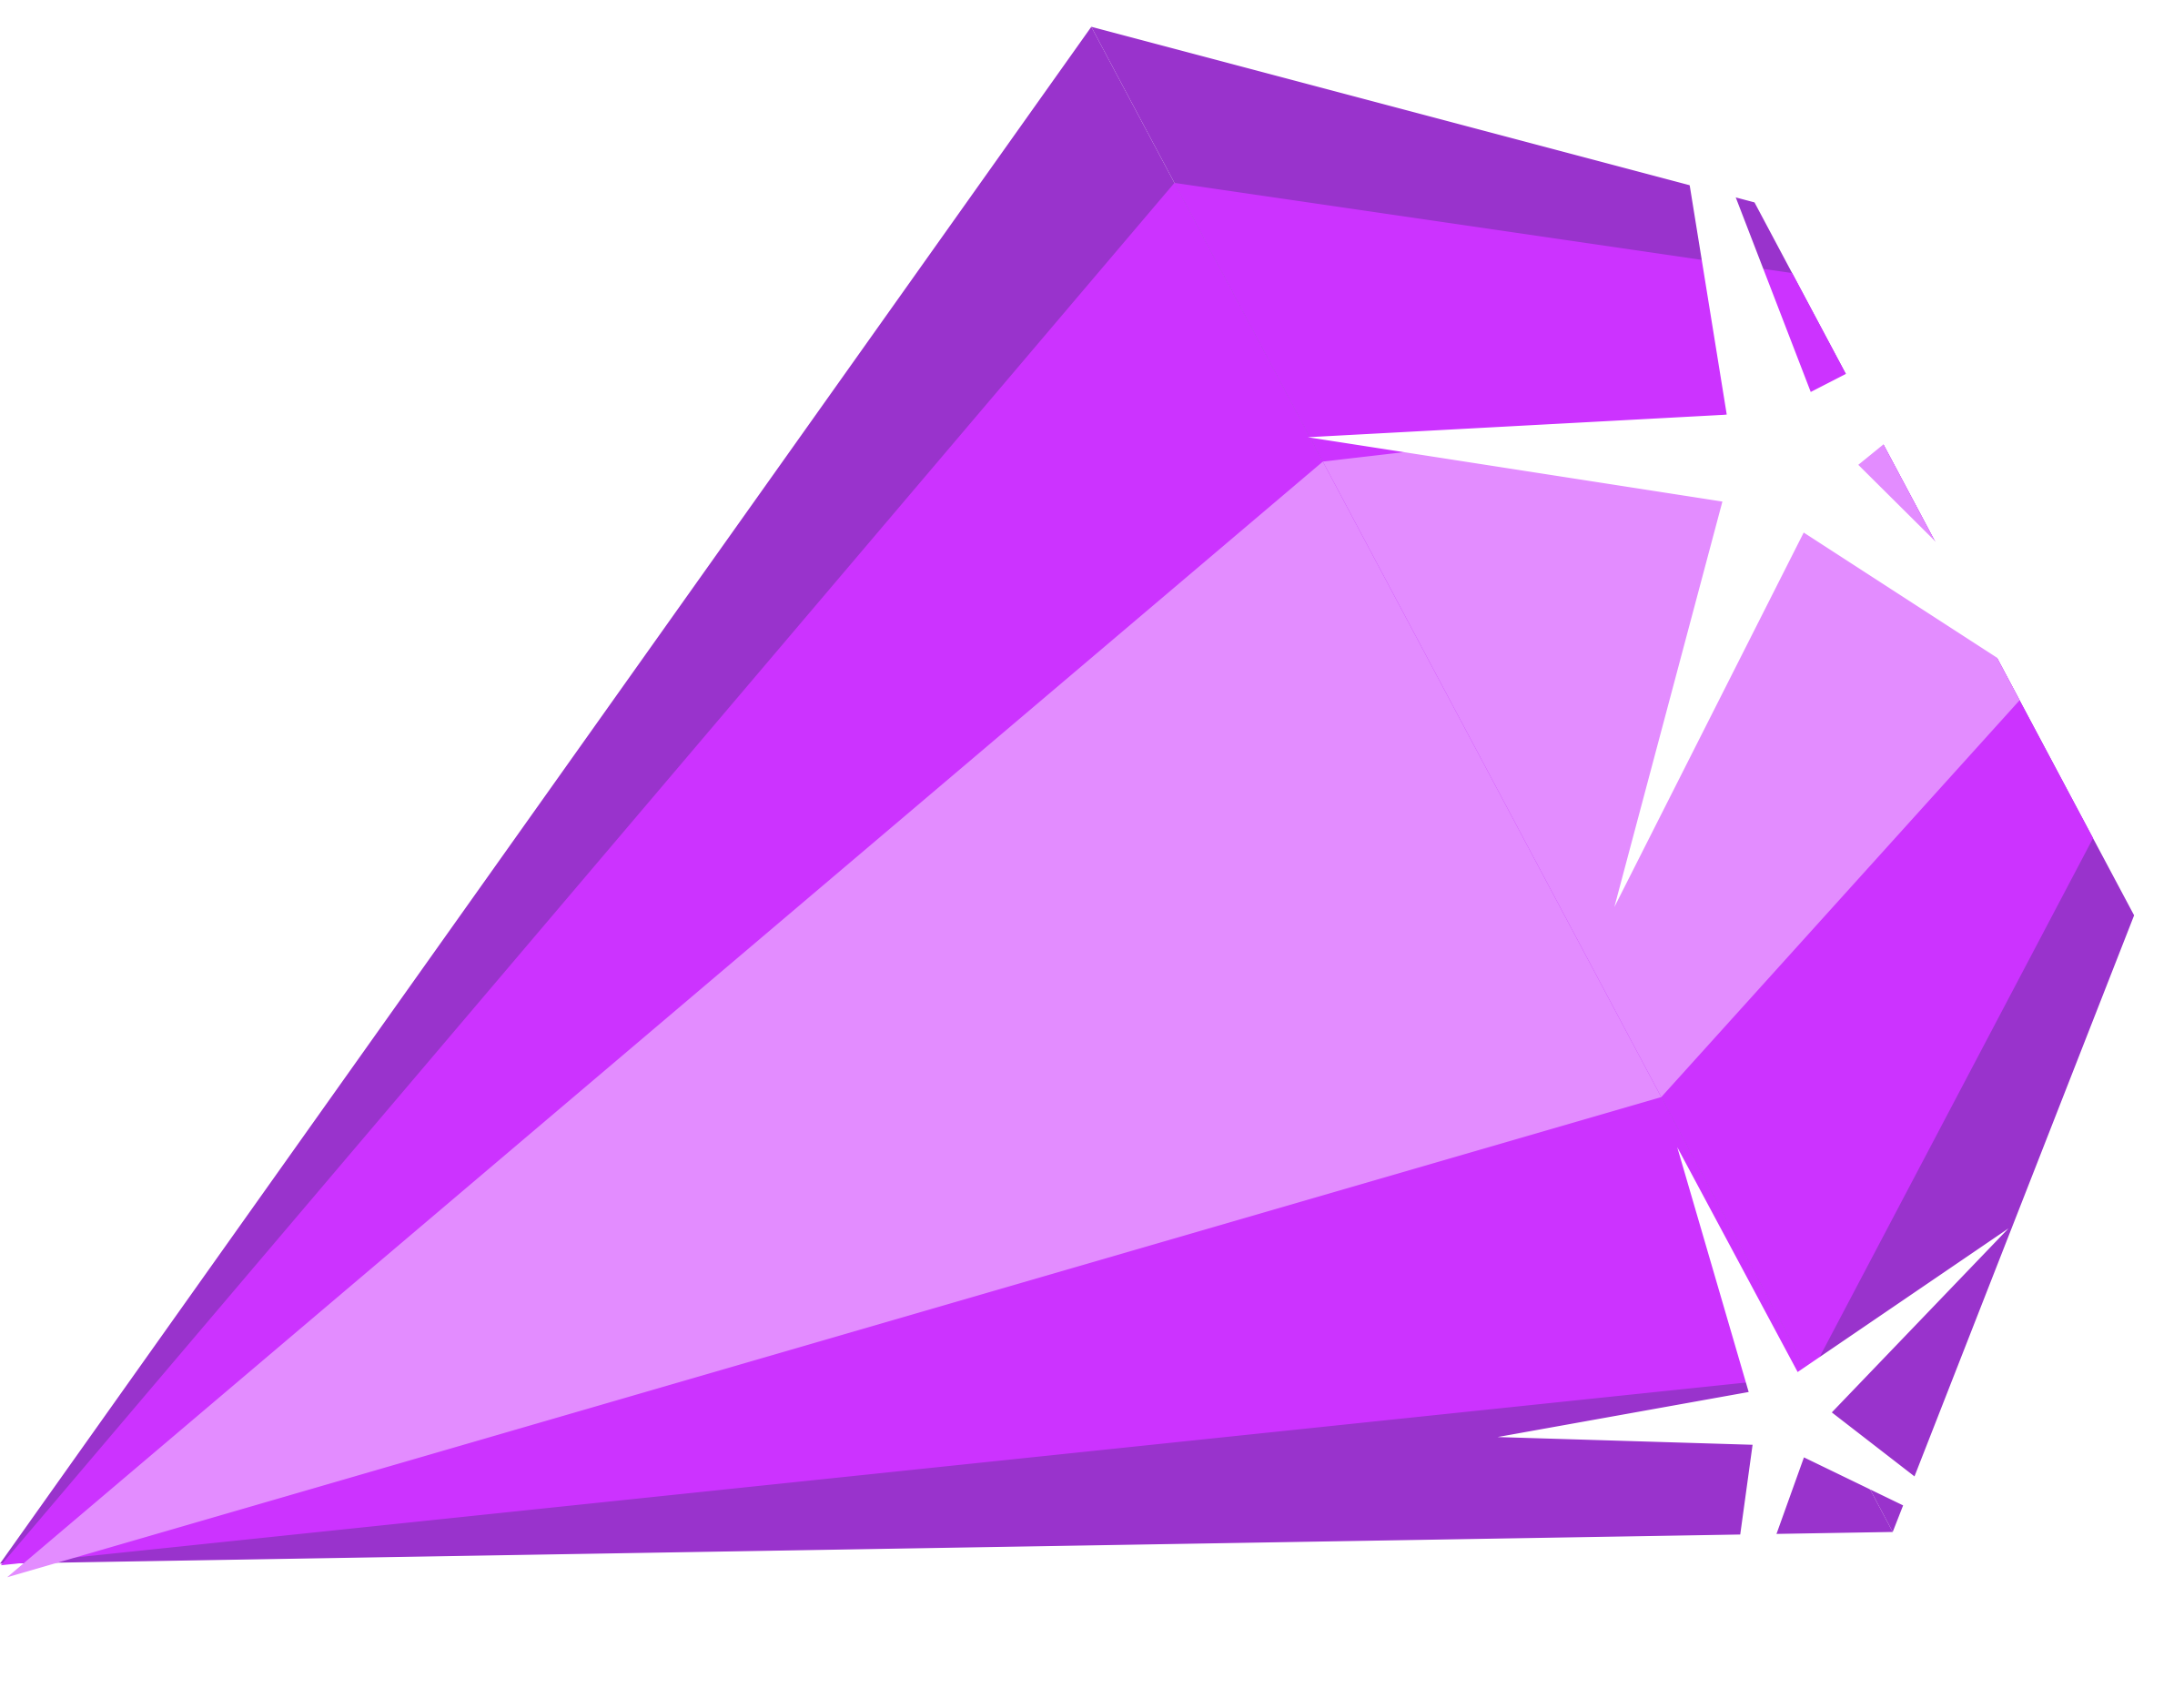 Diamond clipart treasure. Amethyst big image png